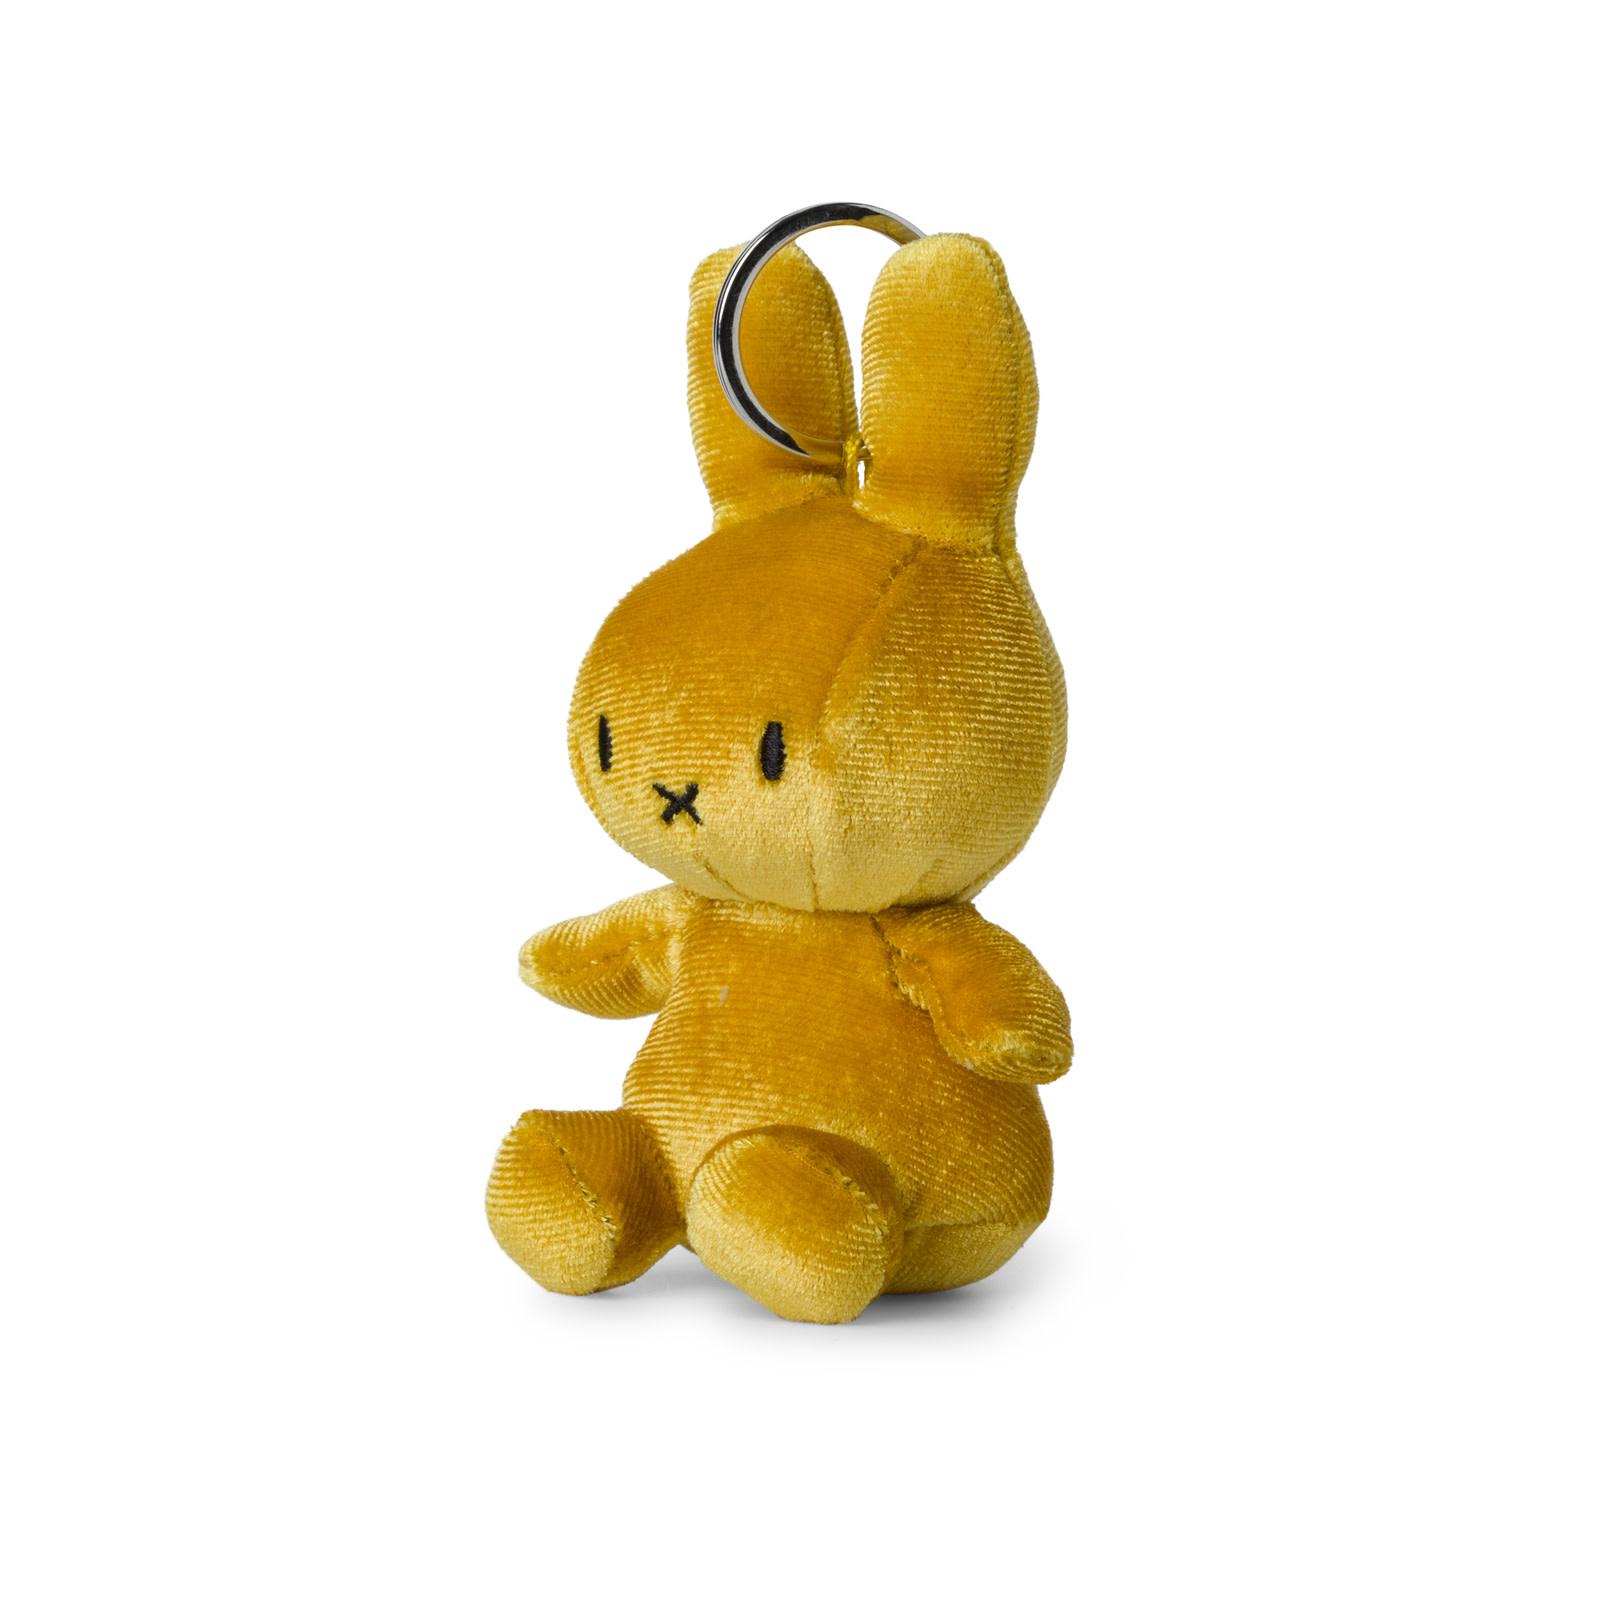 Nijntje/Miffy/Snuffy Miffy Keychain Velvet Oker - 10 cm